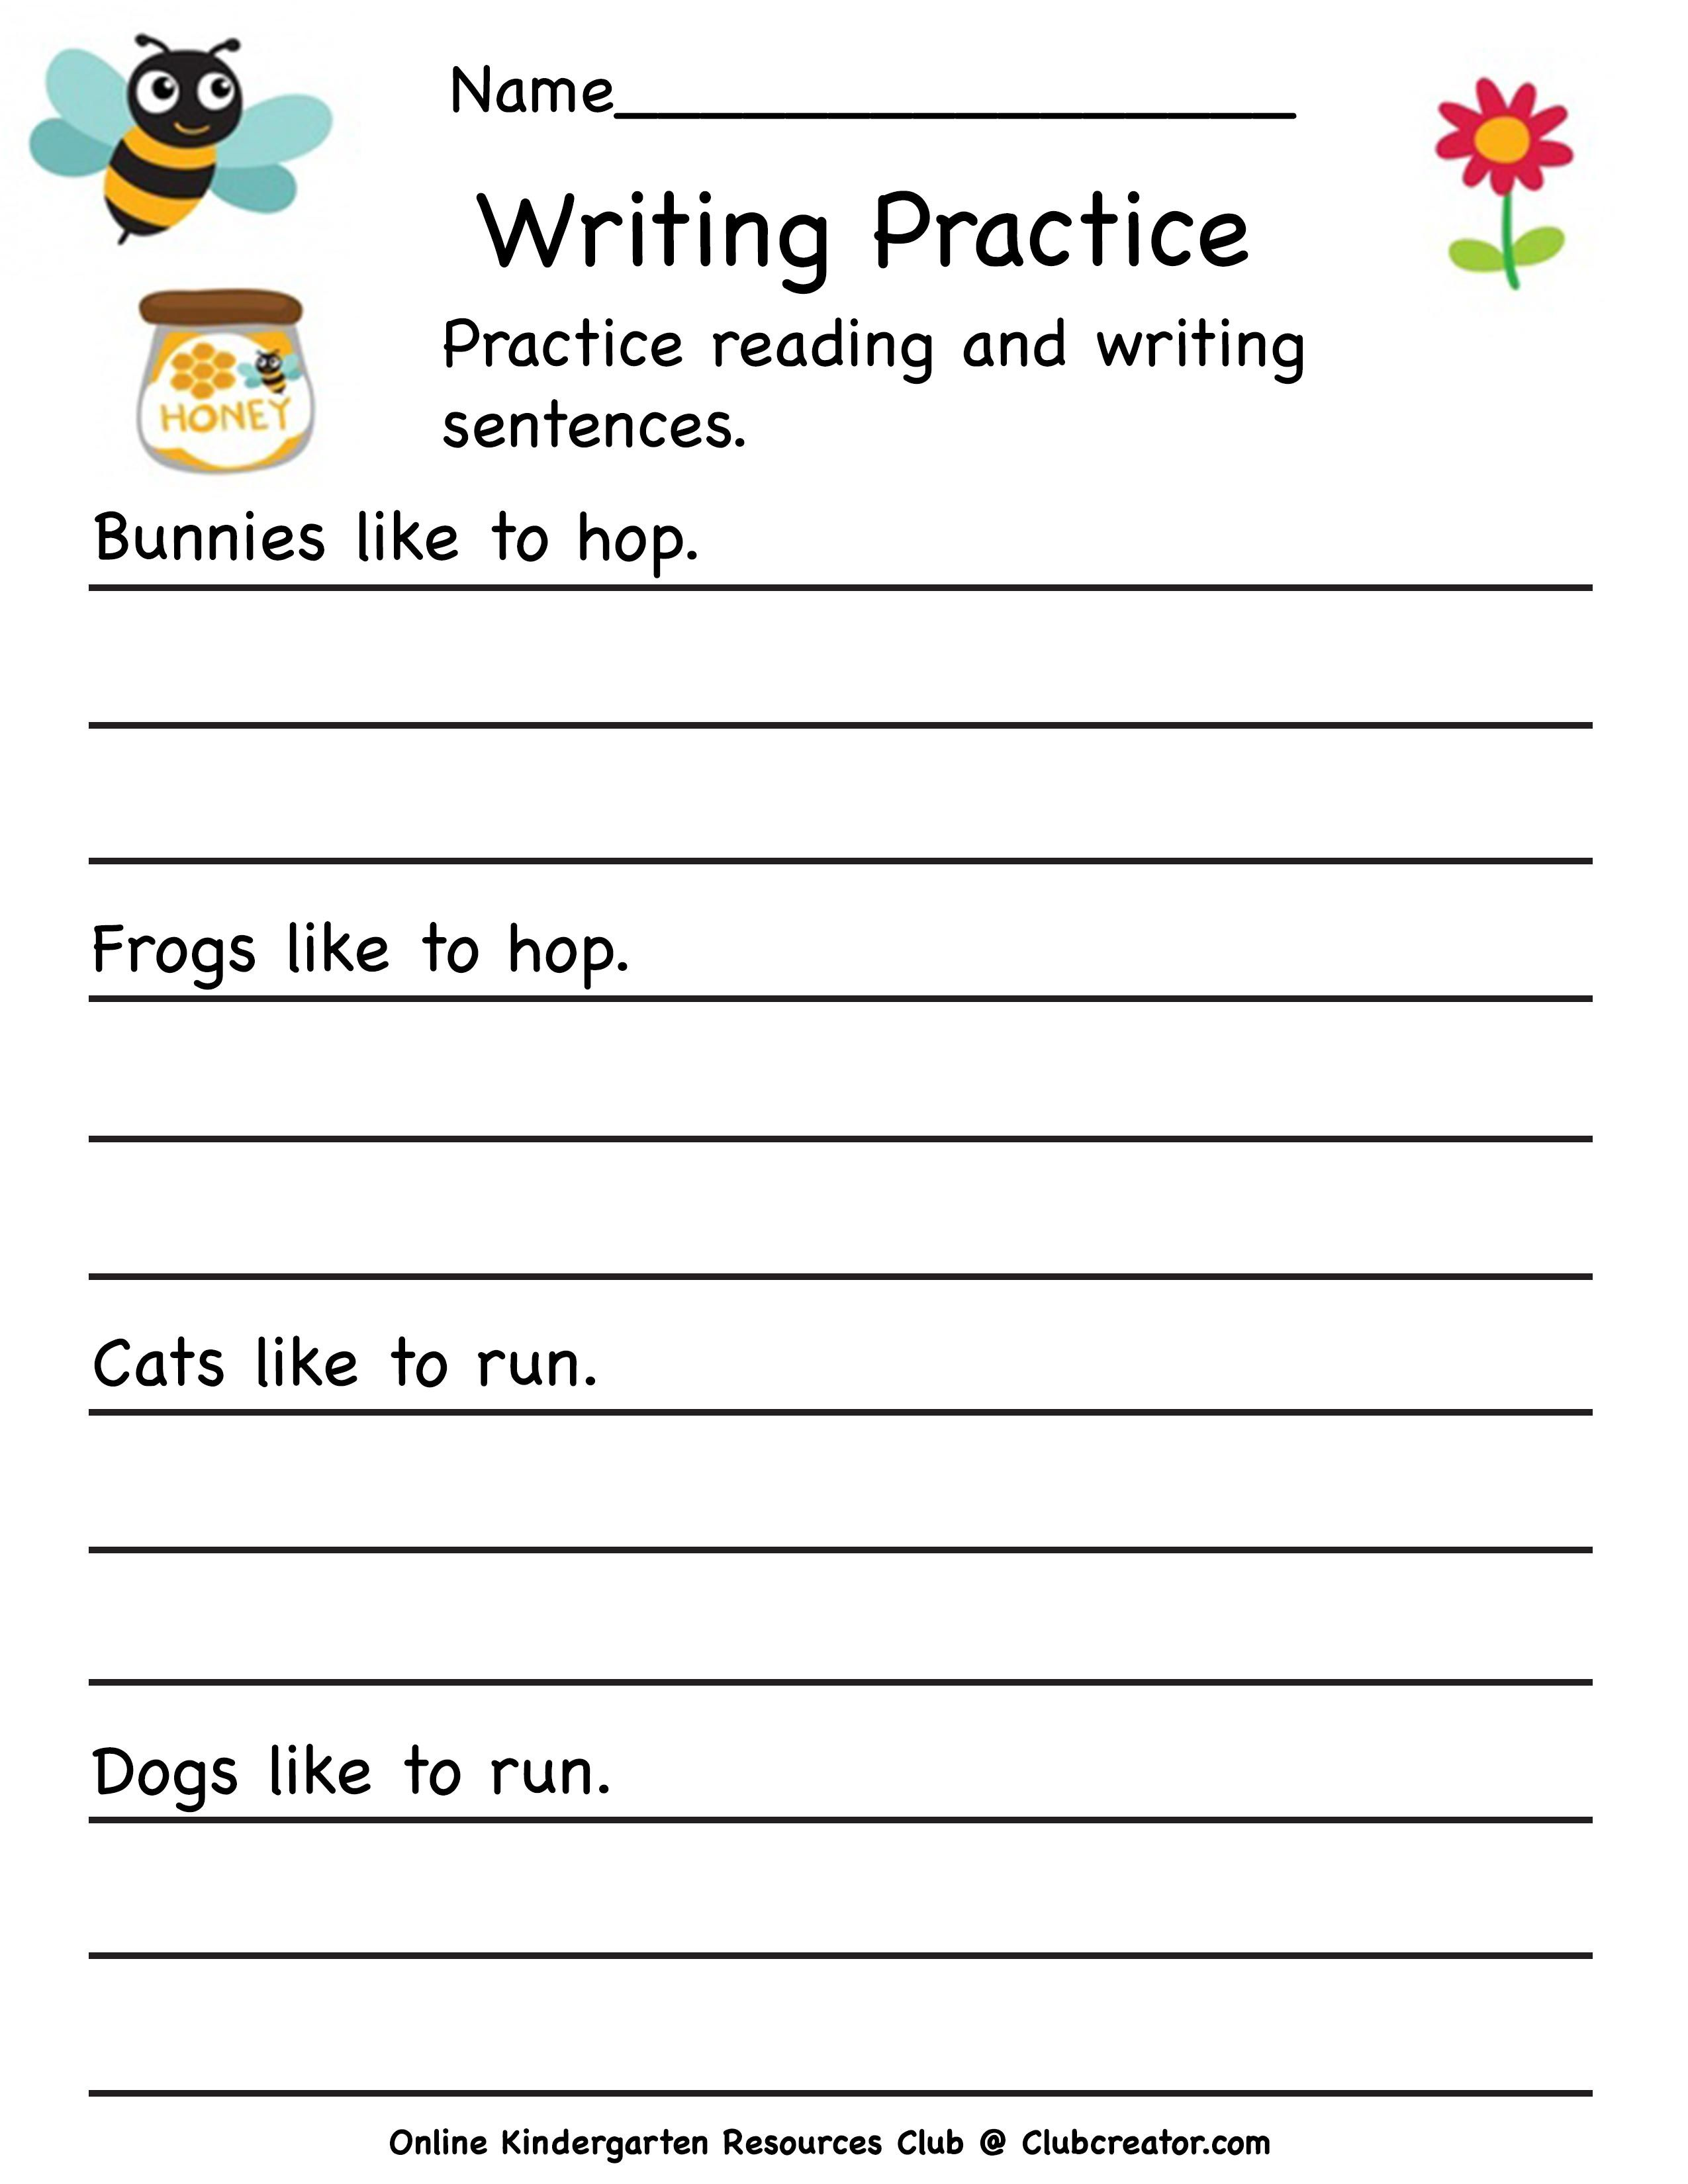 Sentence Writing Practice Writing Practice Worksheets Writing Practice Name Writing Practice